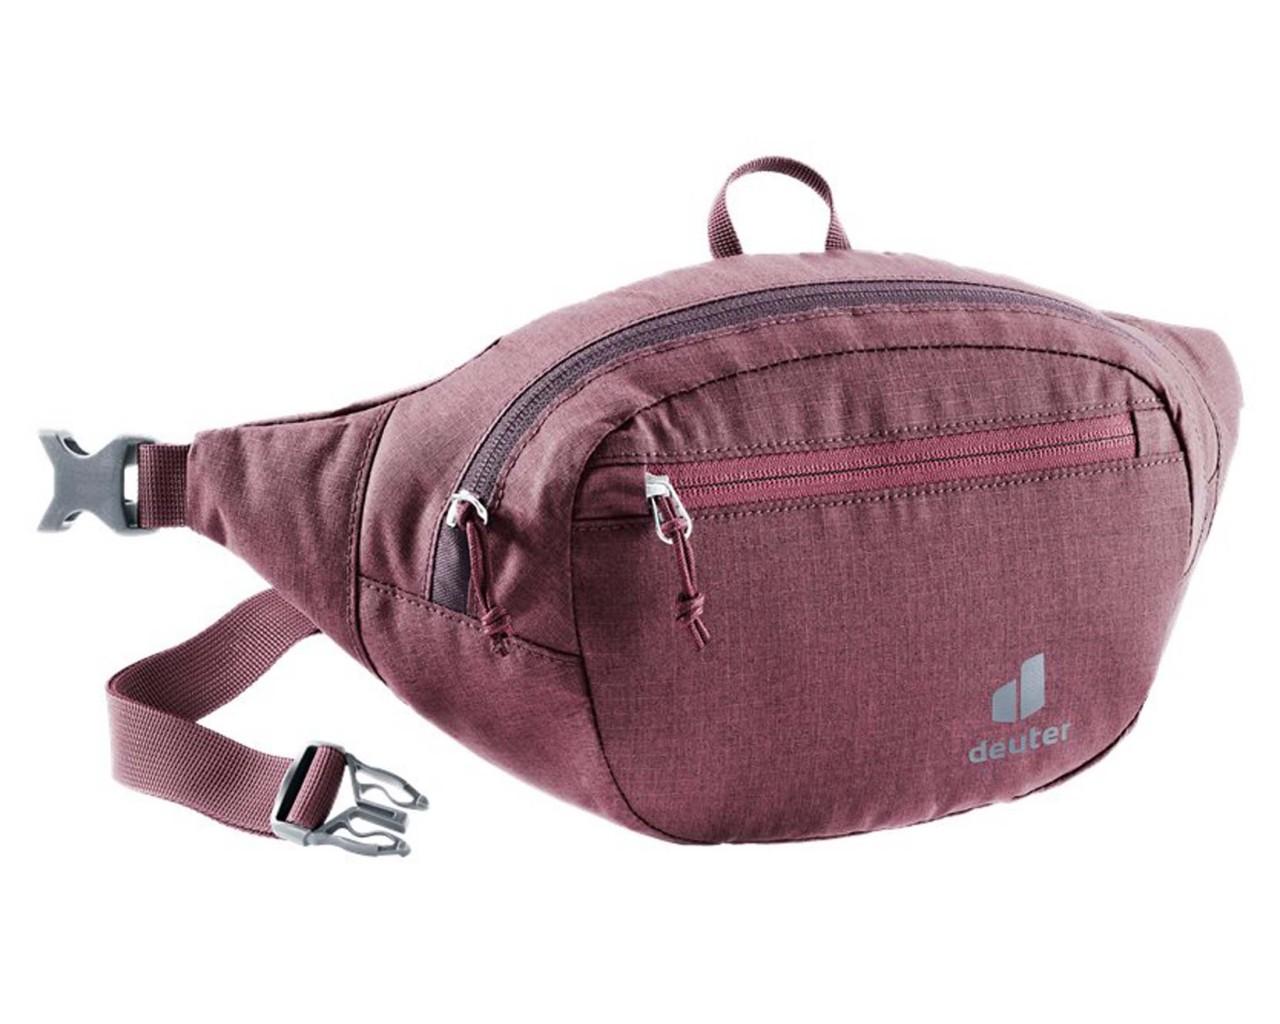 Deuter Belt II - hip bag PFC-free | maron